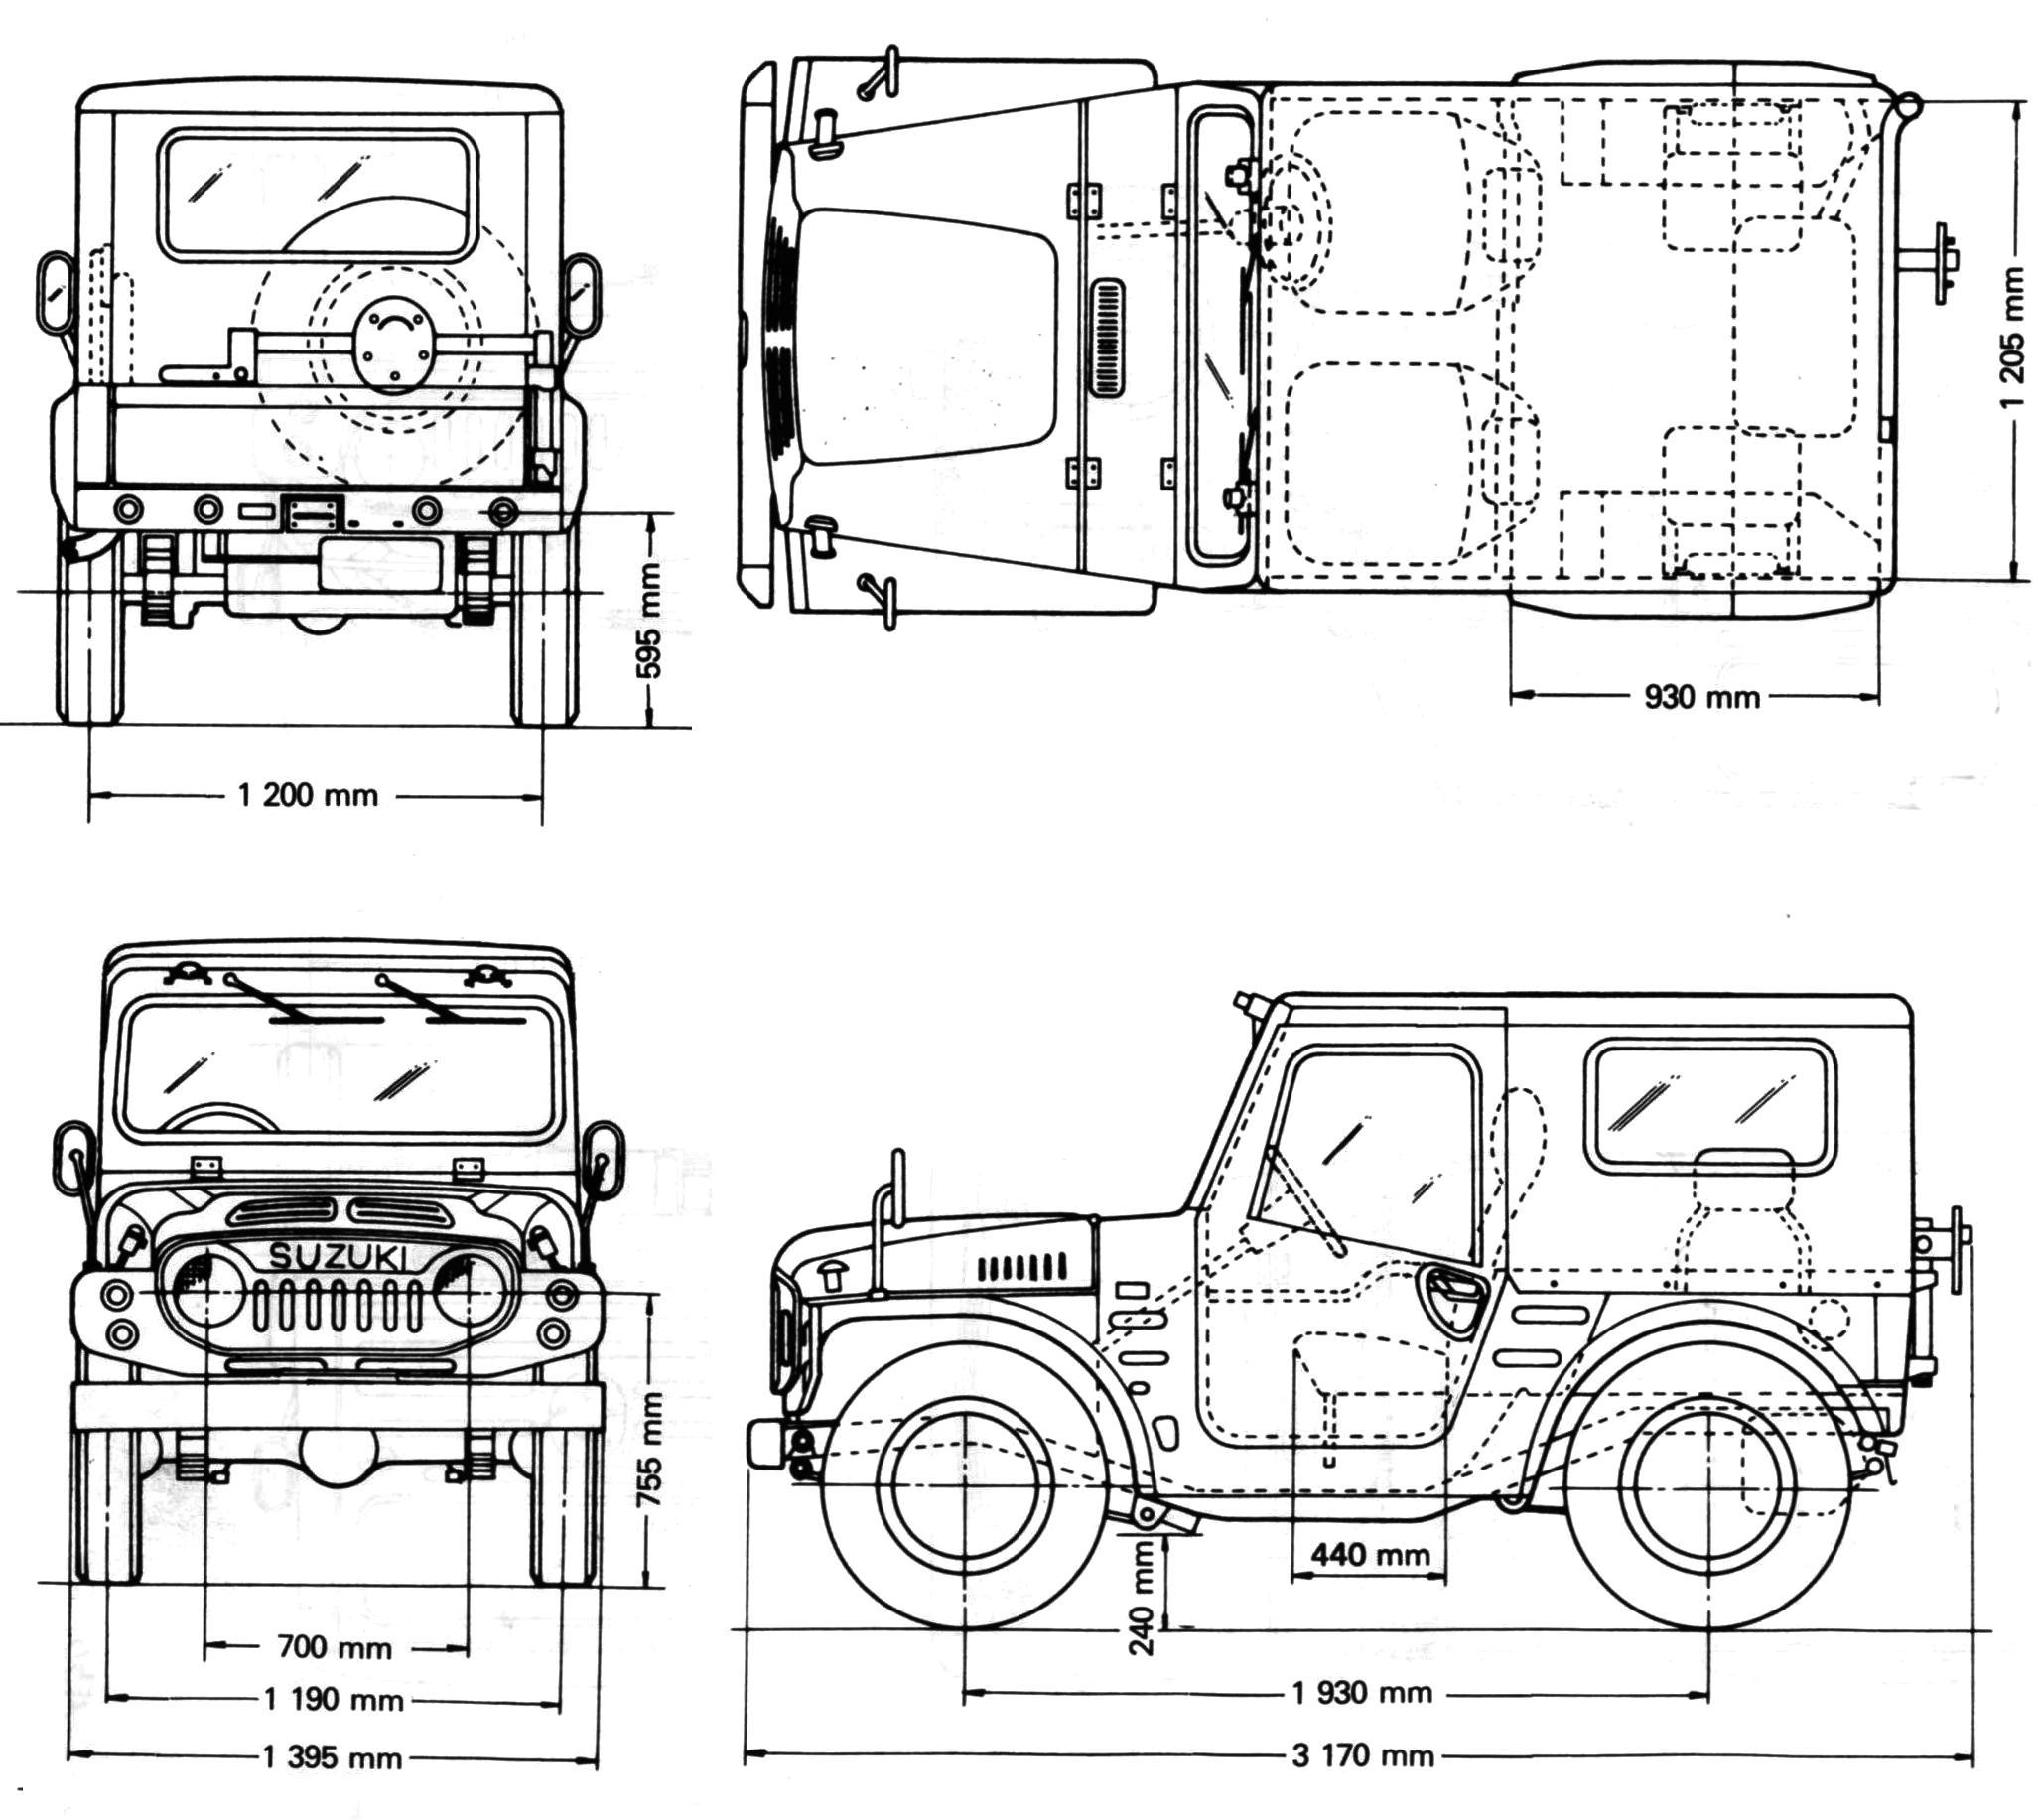 Suzuki Jimny Blueprint